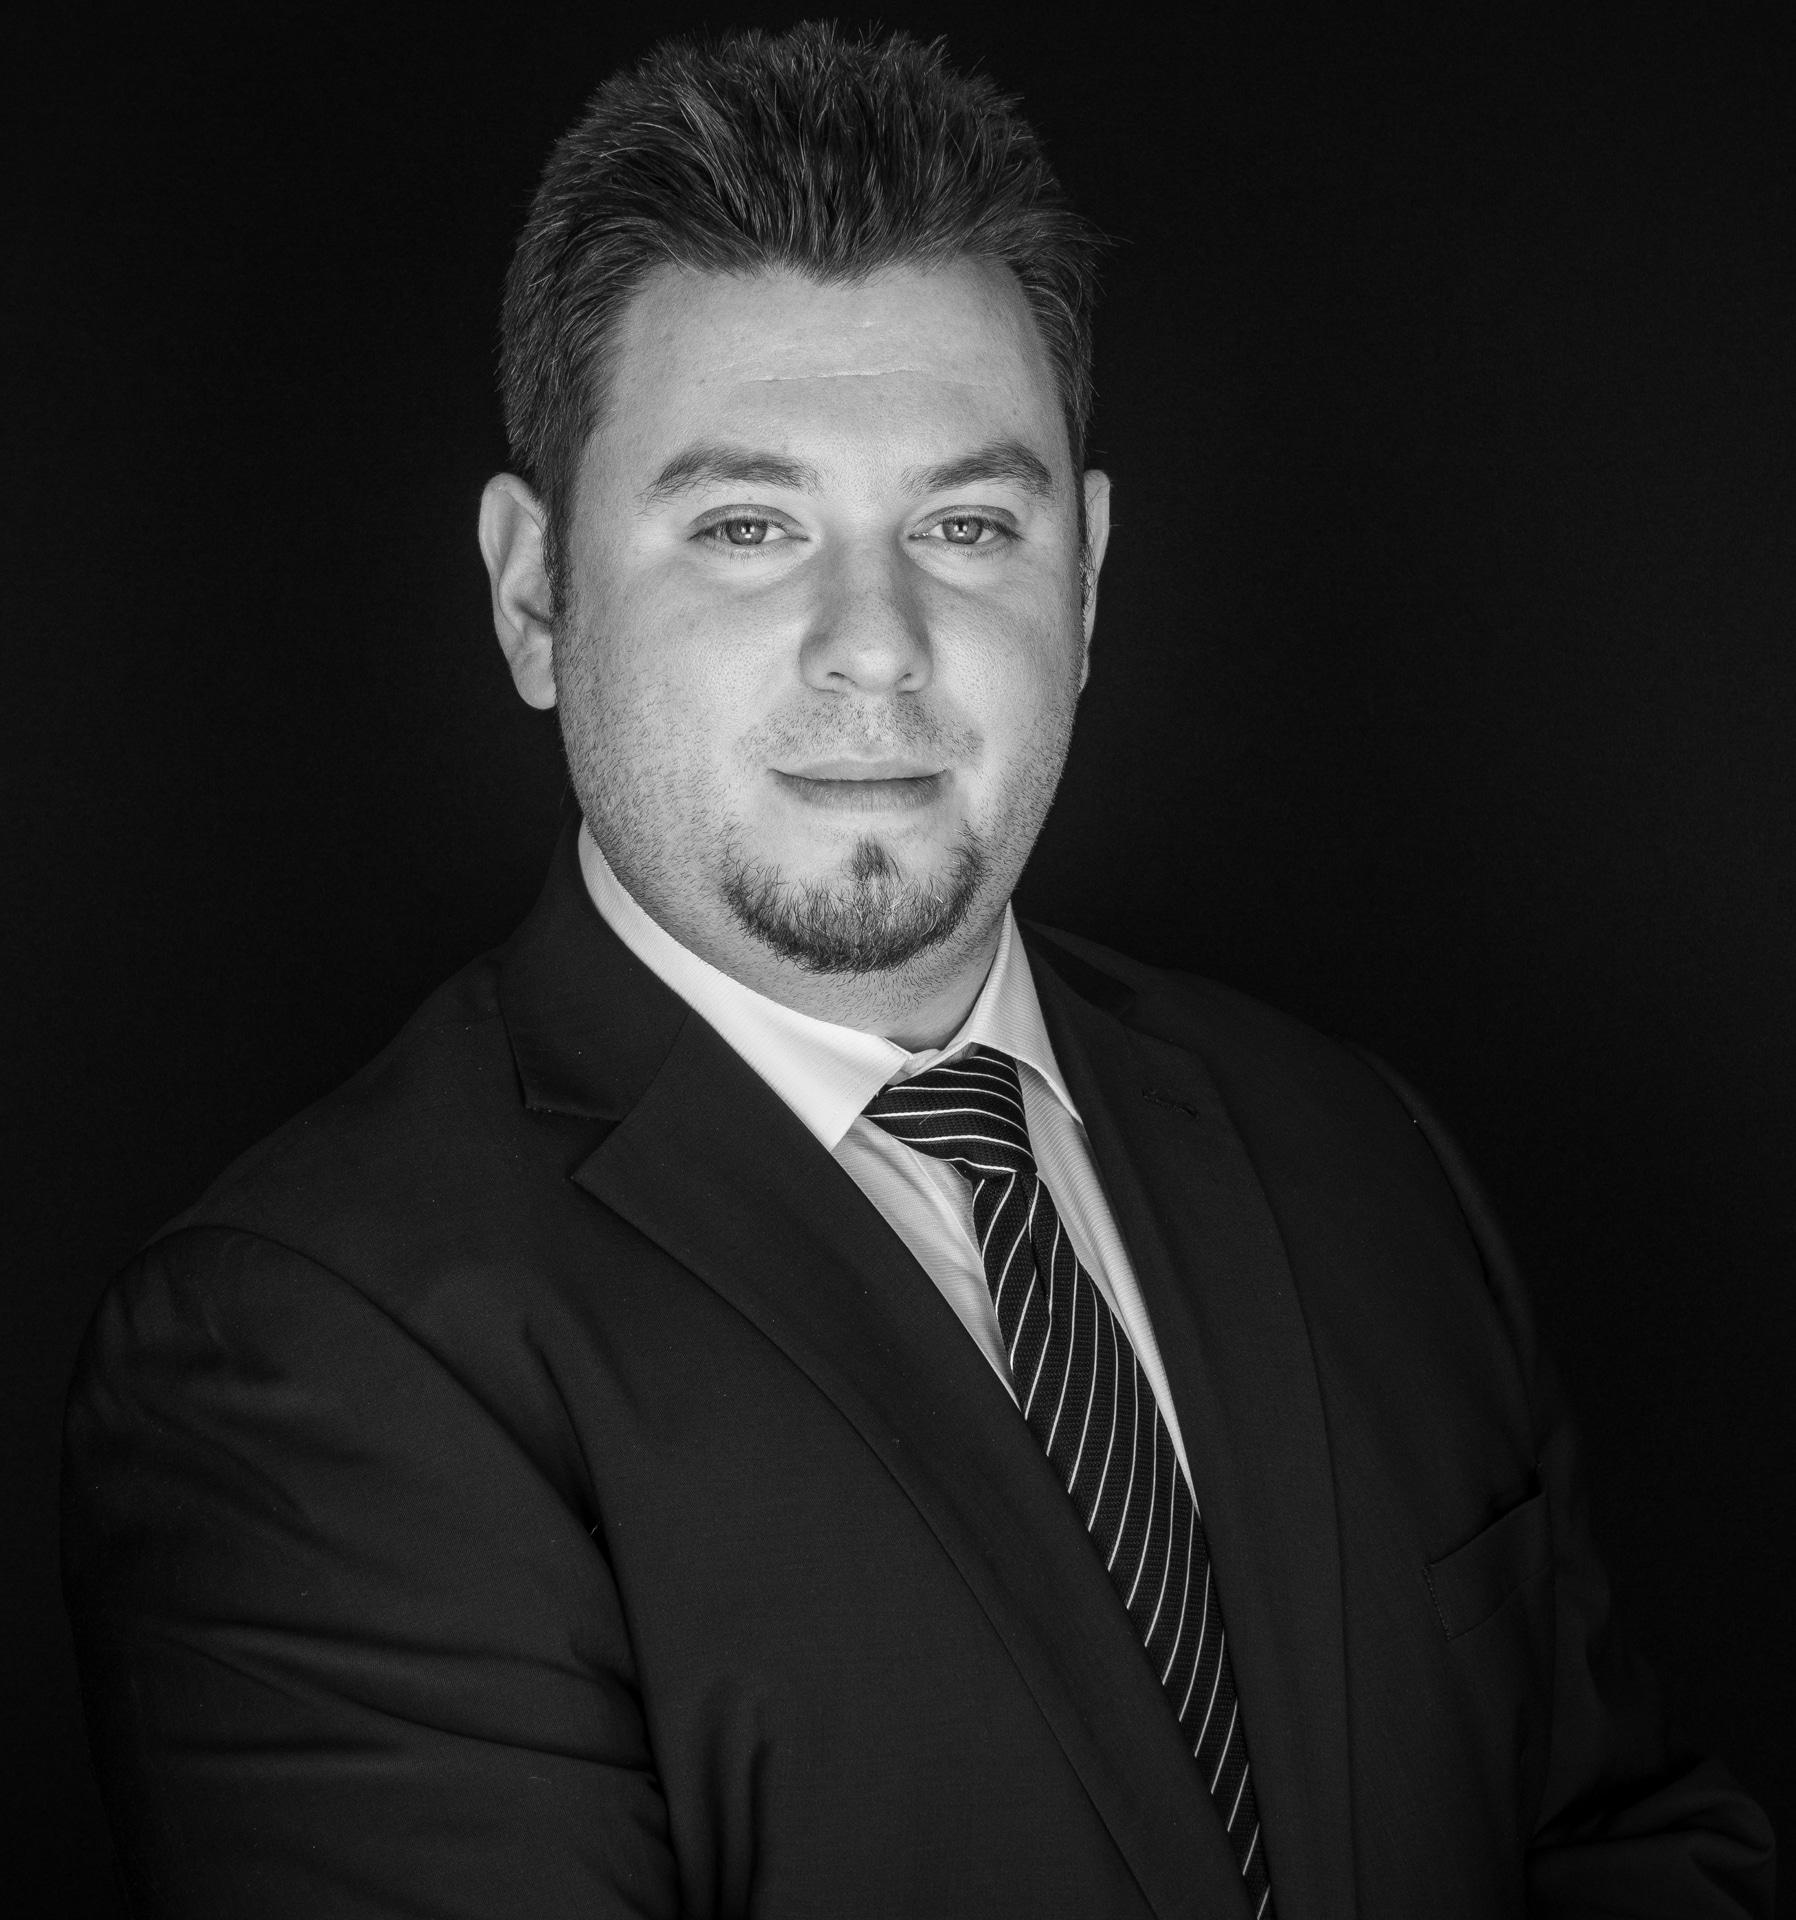 Gabriel Gruzka